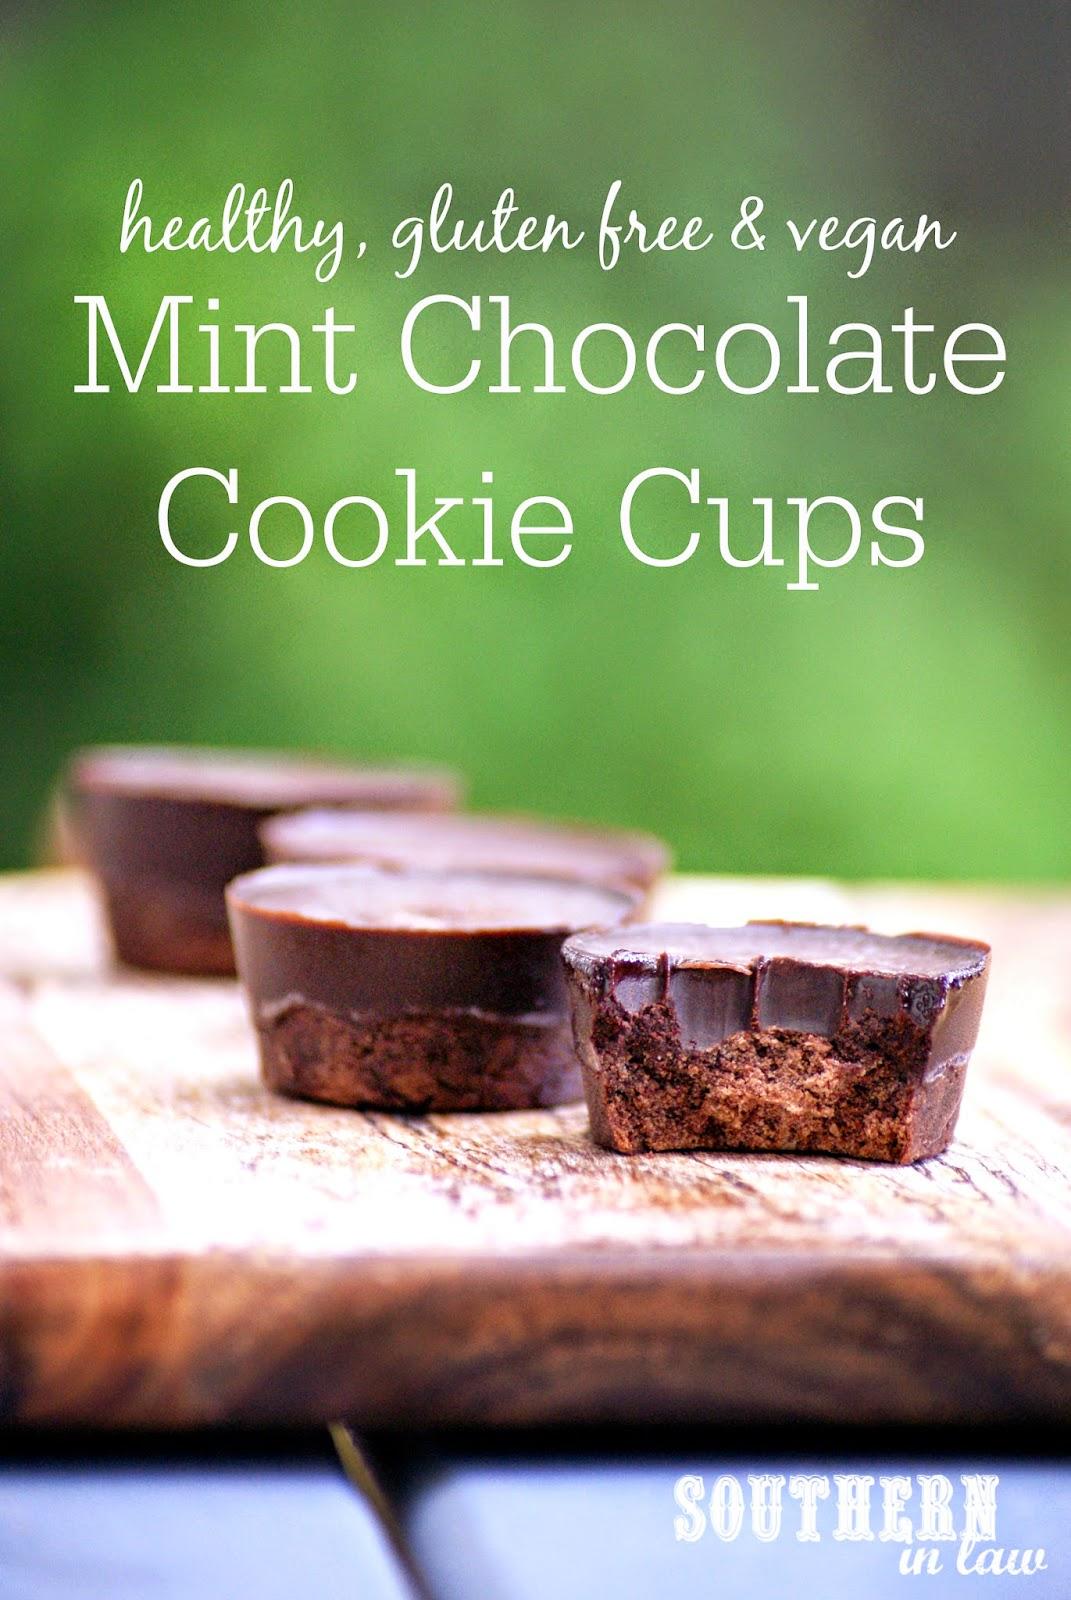 Healthy Mint Chocolate Fudge Cookie Cups Recipe - Healthy Mint Slice Biscuit Recipe - Healthy Thin Mint Cookie Recipe - gluten free, vegan, refined sugar free, dairy free, egg free